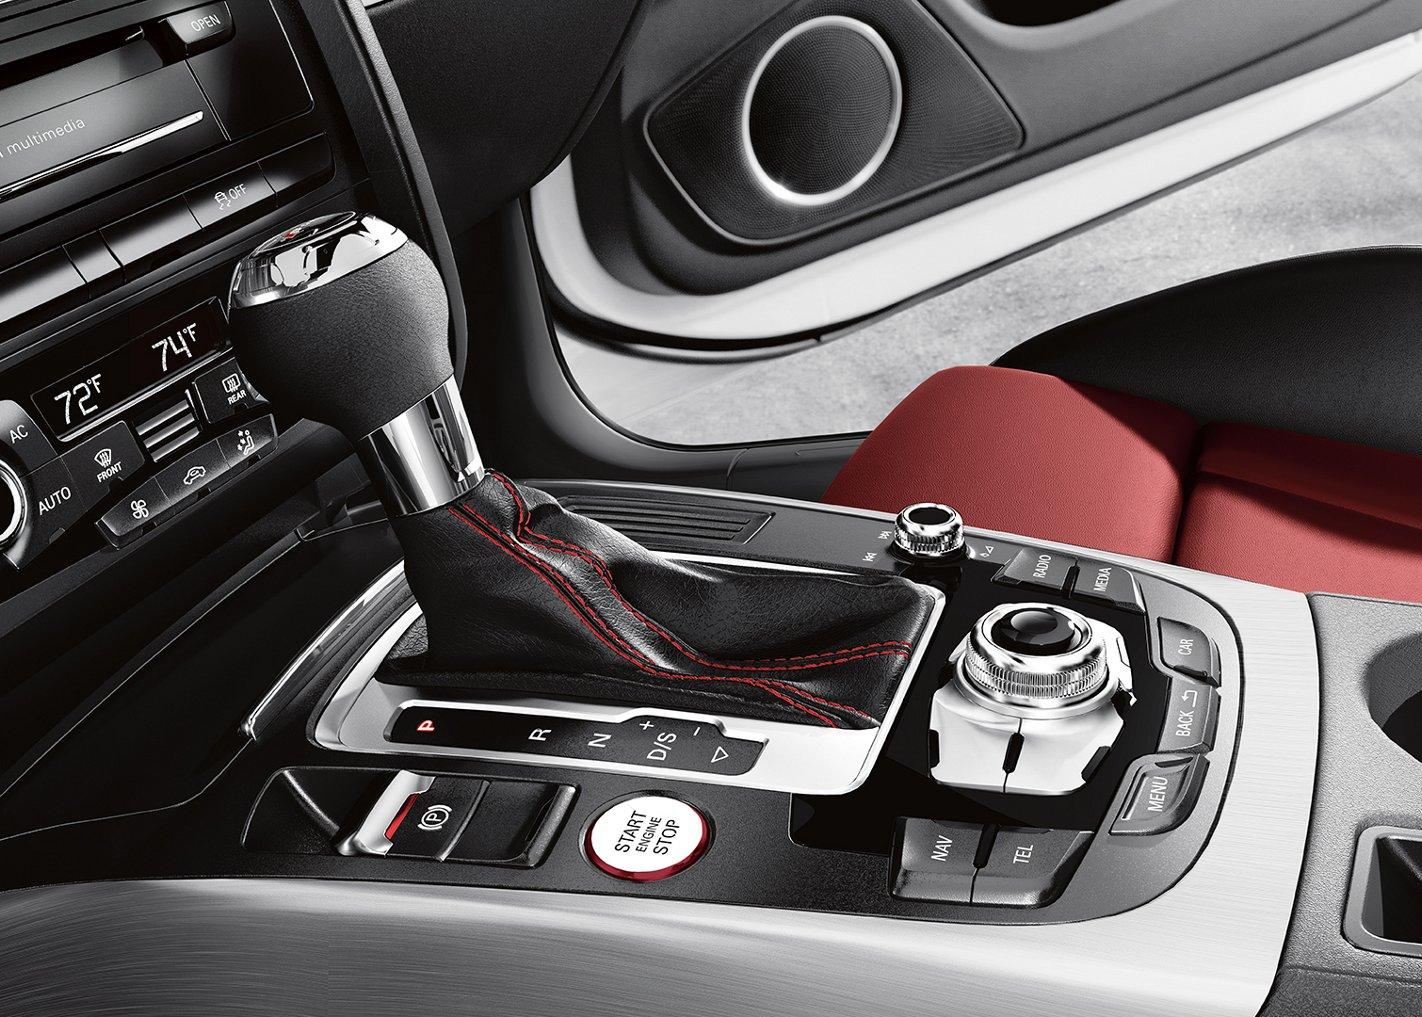 New Audi S5 Interior image 1